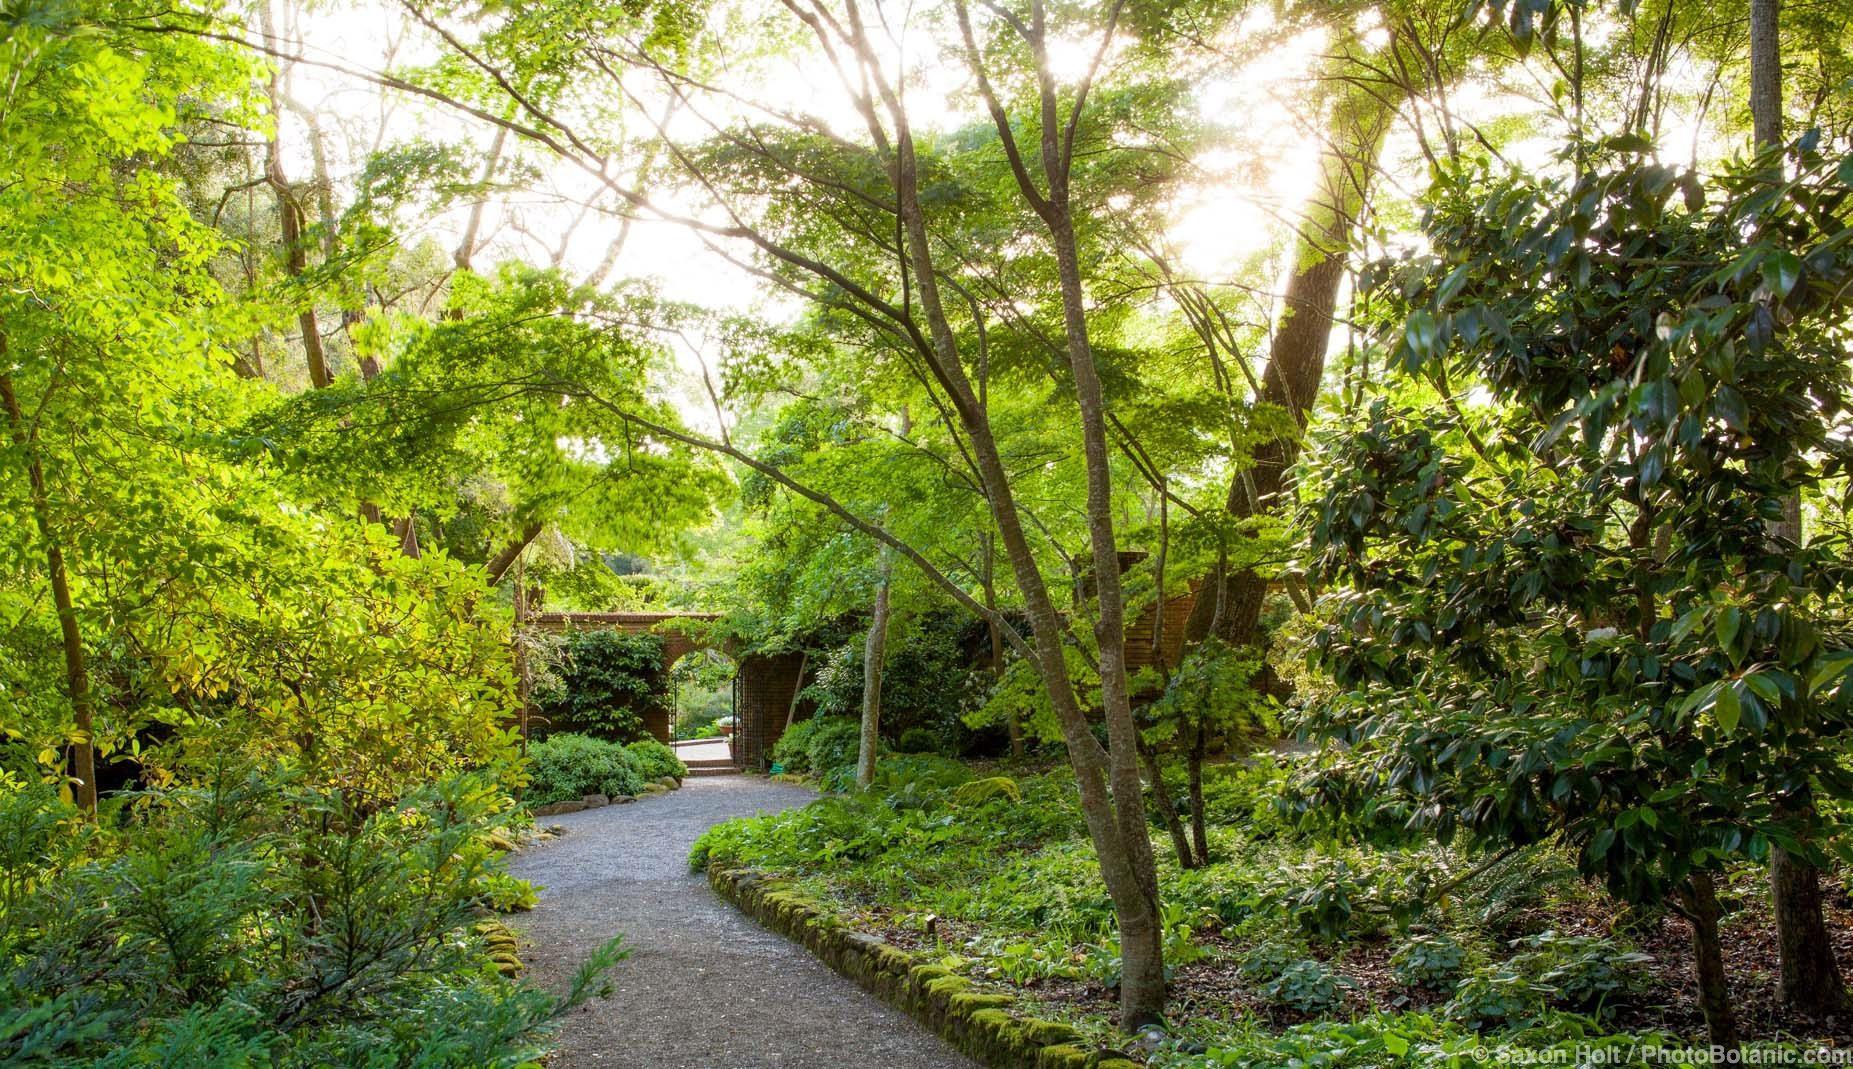 in woodland garden to open door into walled garden in morning light at Filoli